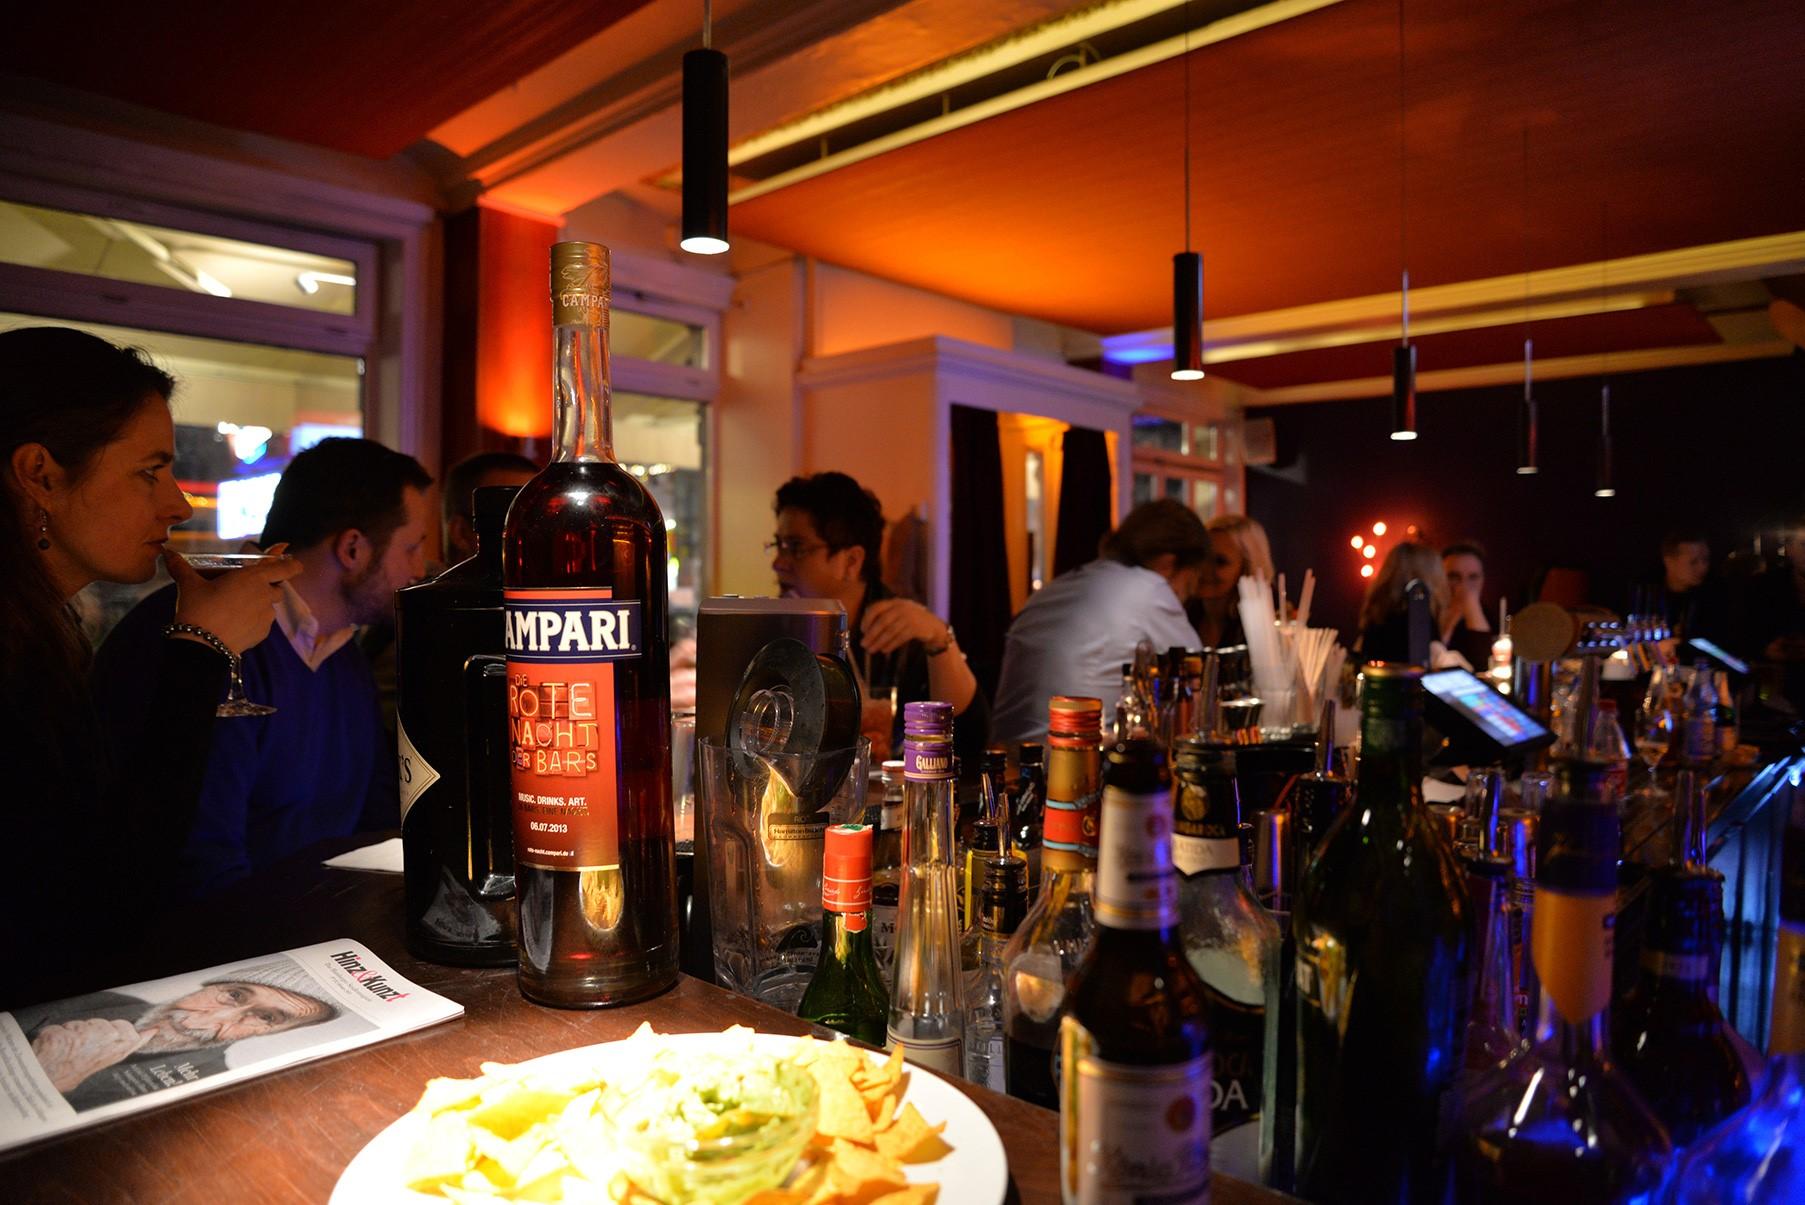 St. Pauli Theater Bar © St. Pauli Theater Bar